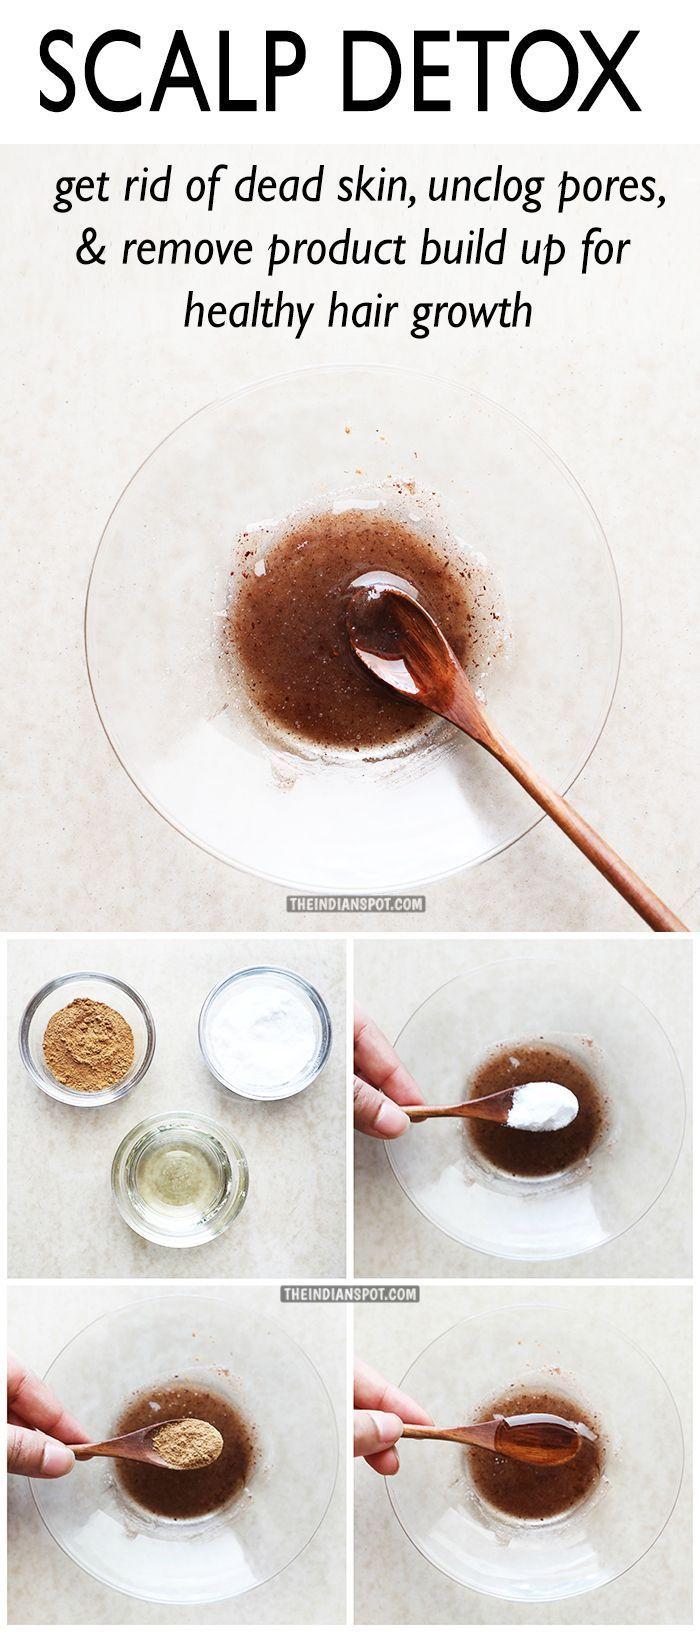 Scalp Detox 1 Teaspoon Of Baking Soda 1 Tablespoon Of Olive Oil 1 4